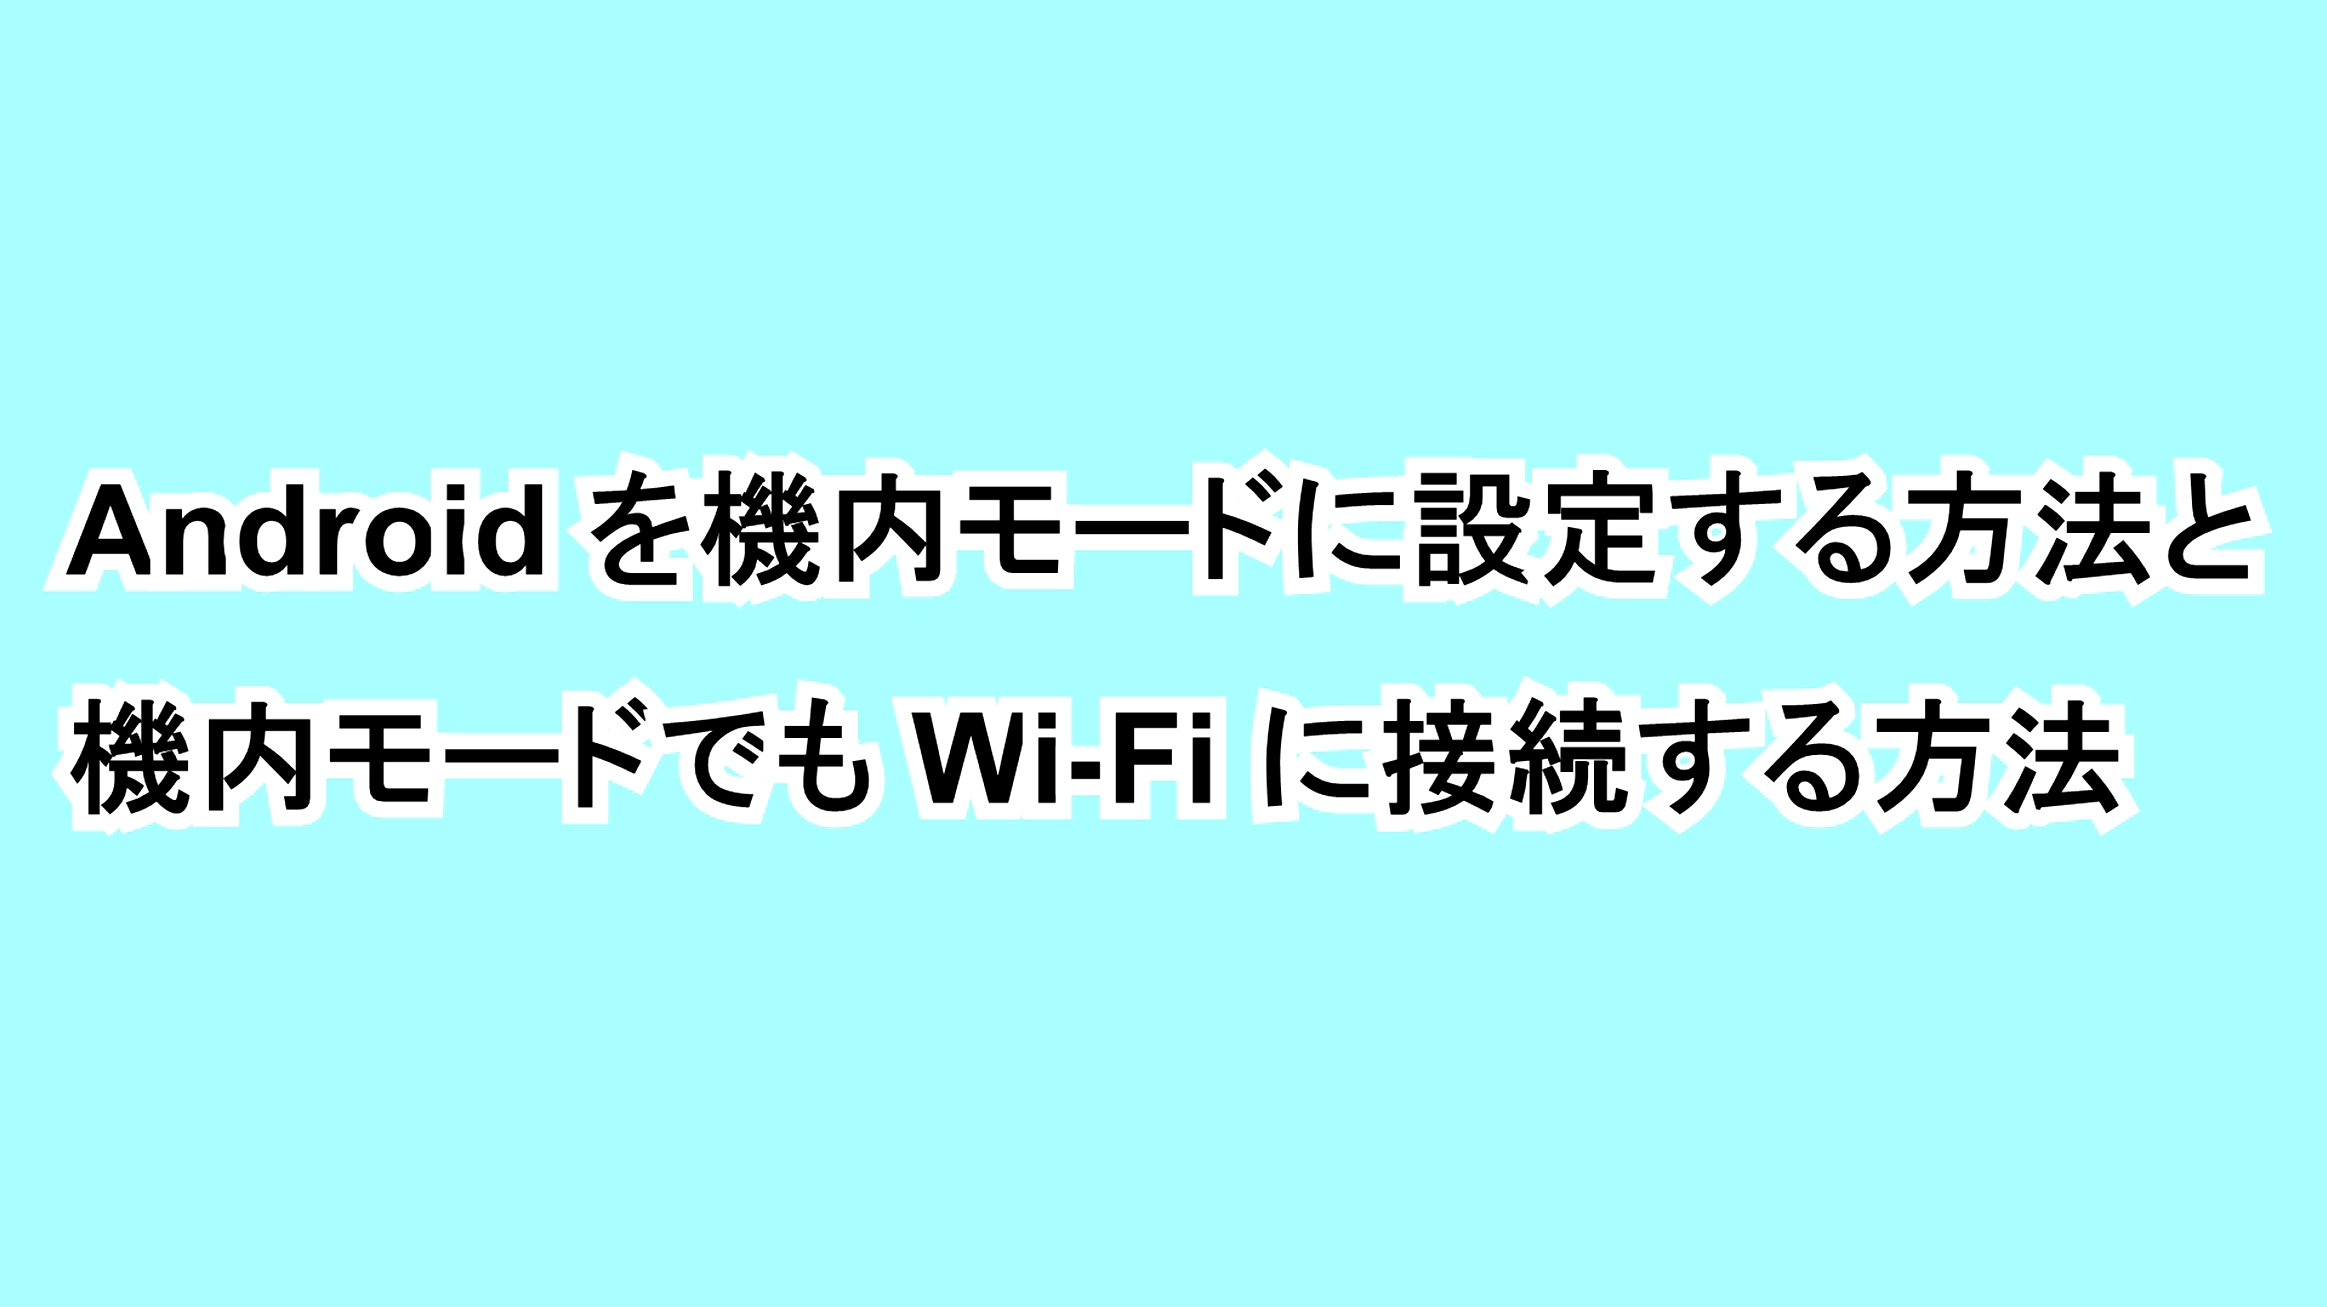 Androidを機内モードに設定する方法と機内モードでもWi-Fiに接続する方法